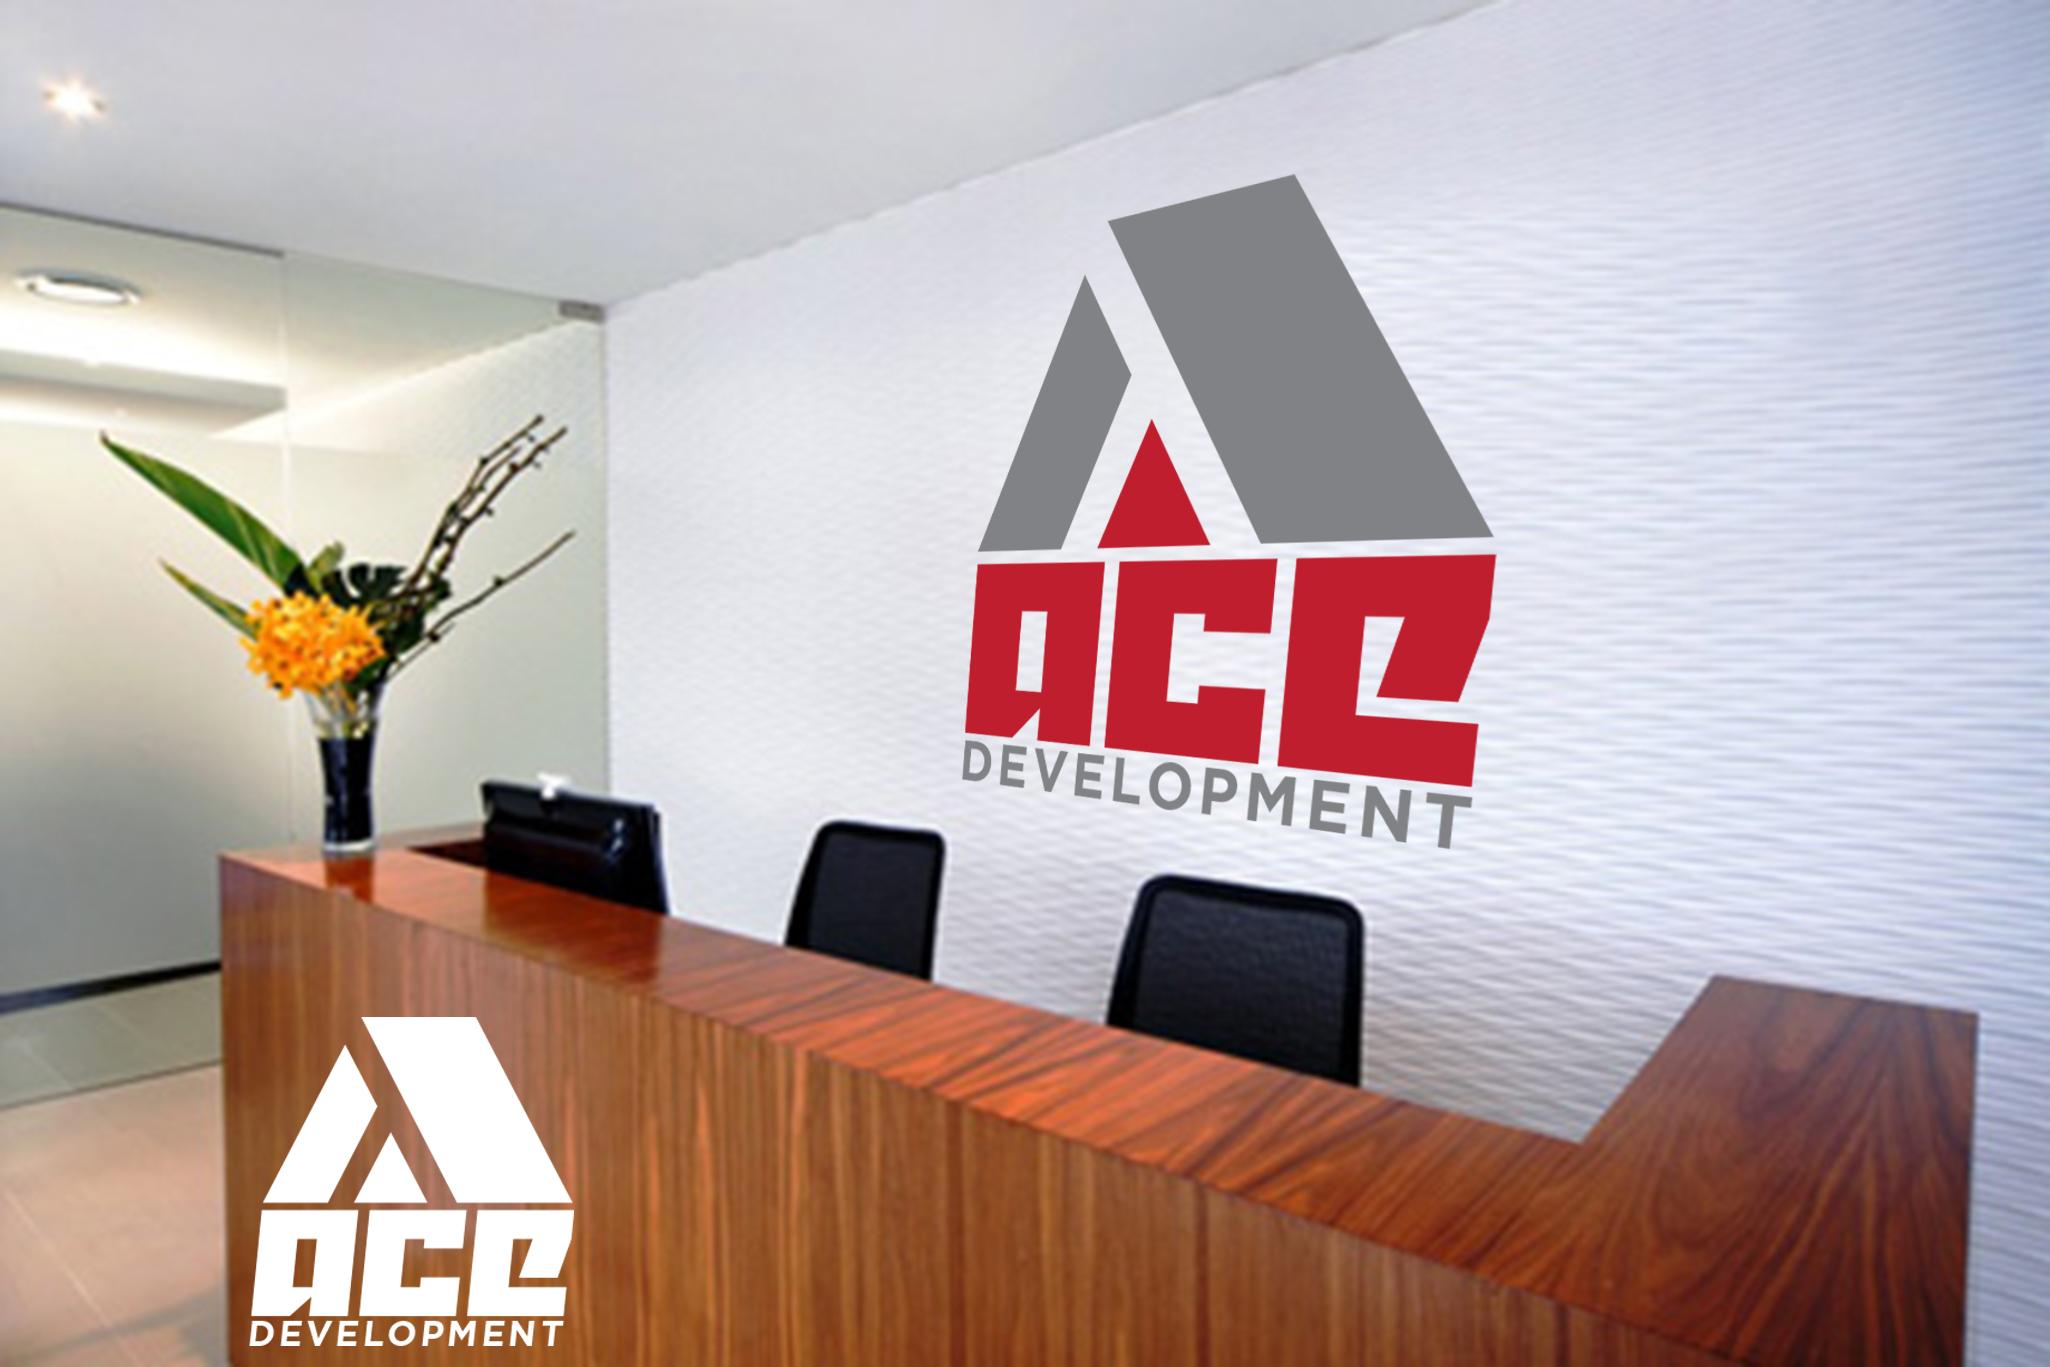 Logo Design by Rob King - Entry No. 41 in the Logo Design Contest Fun Logo Design for Ace development.